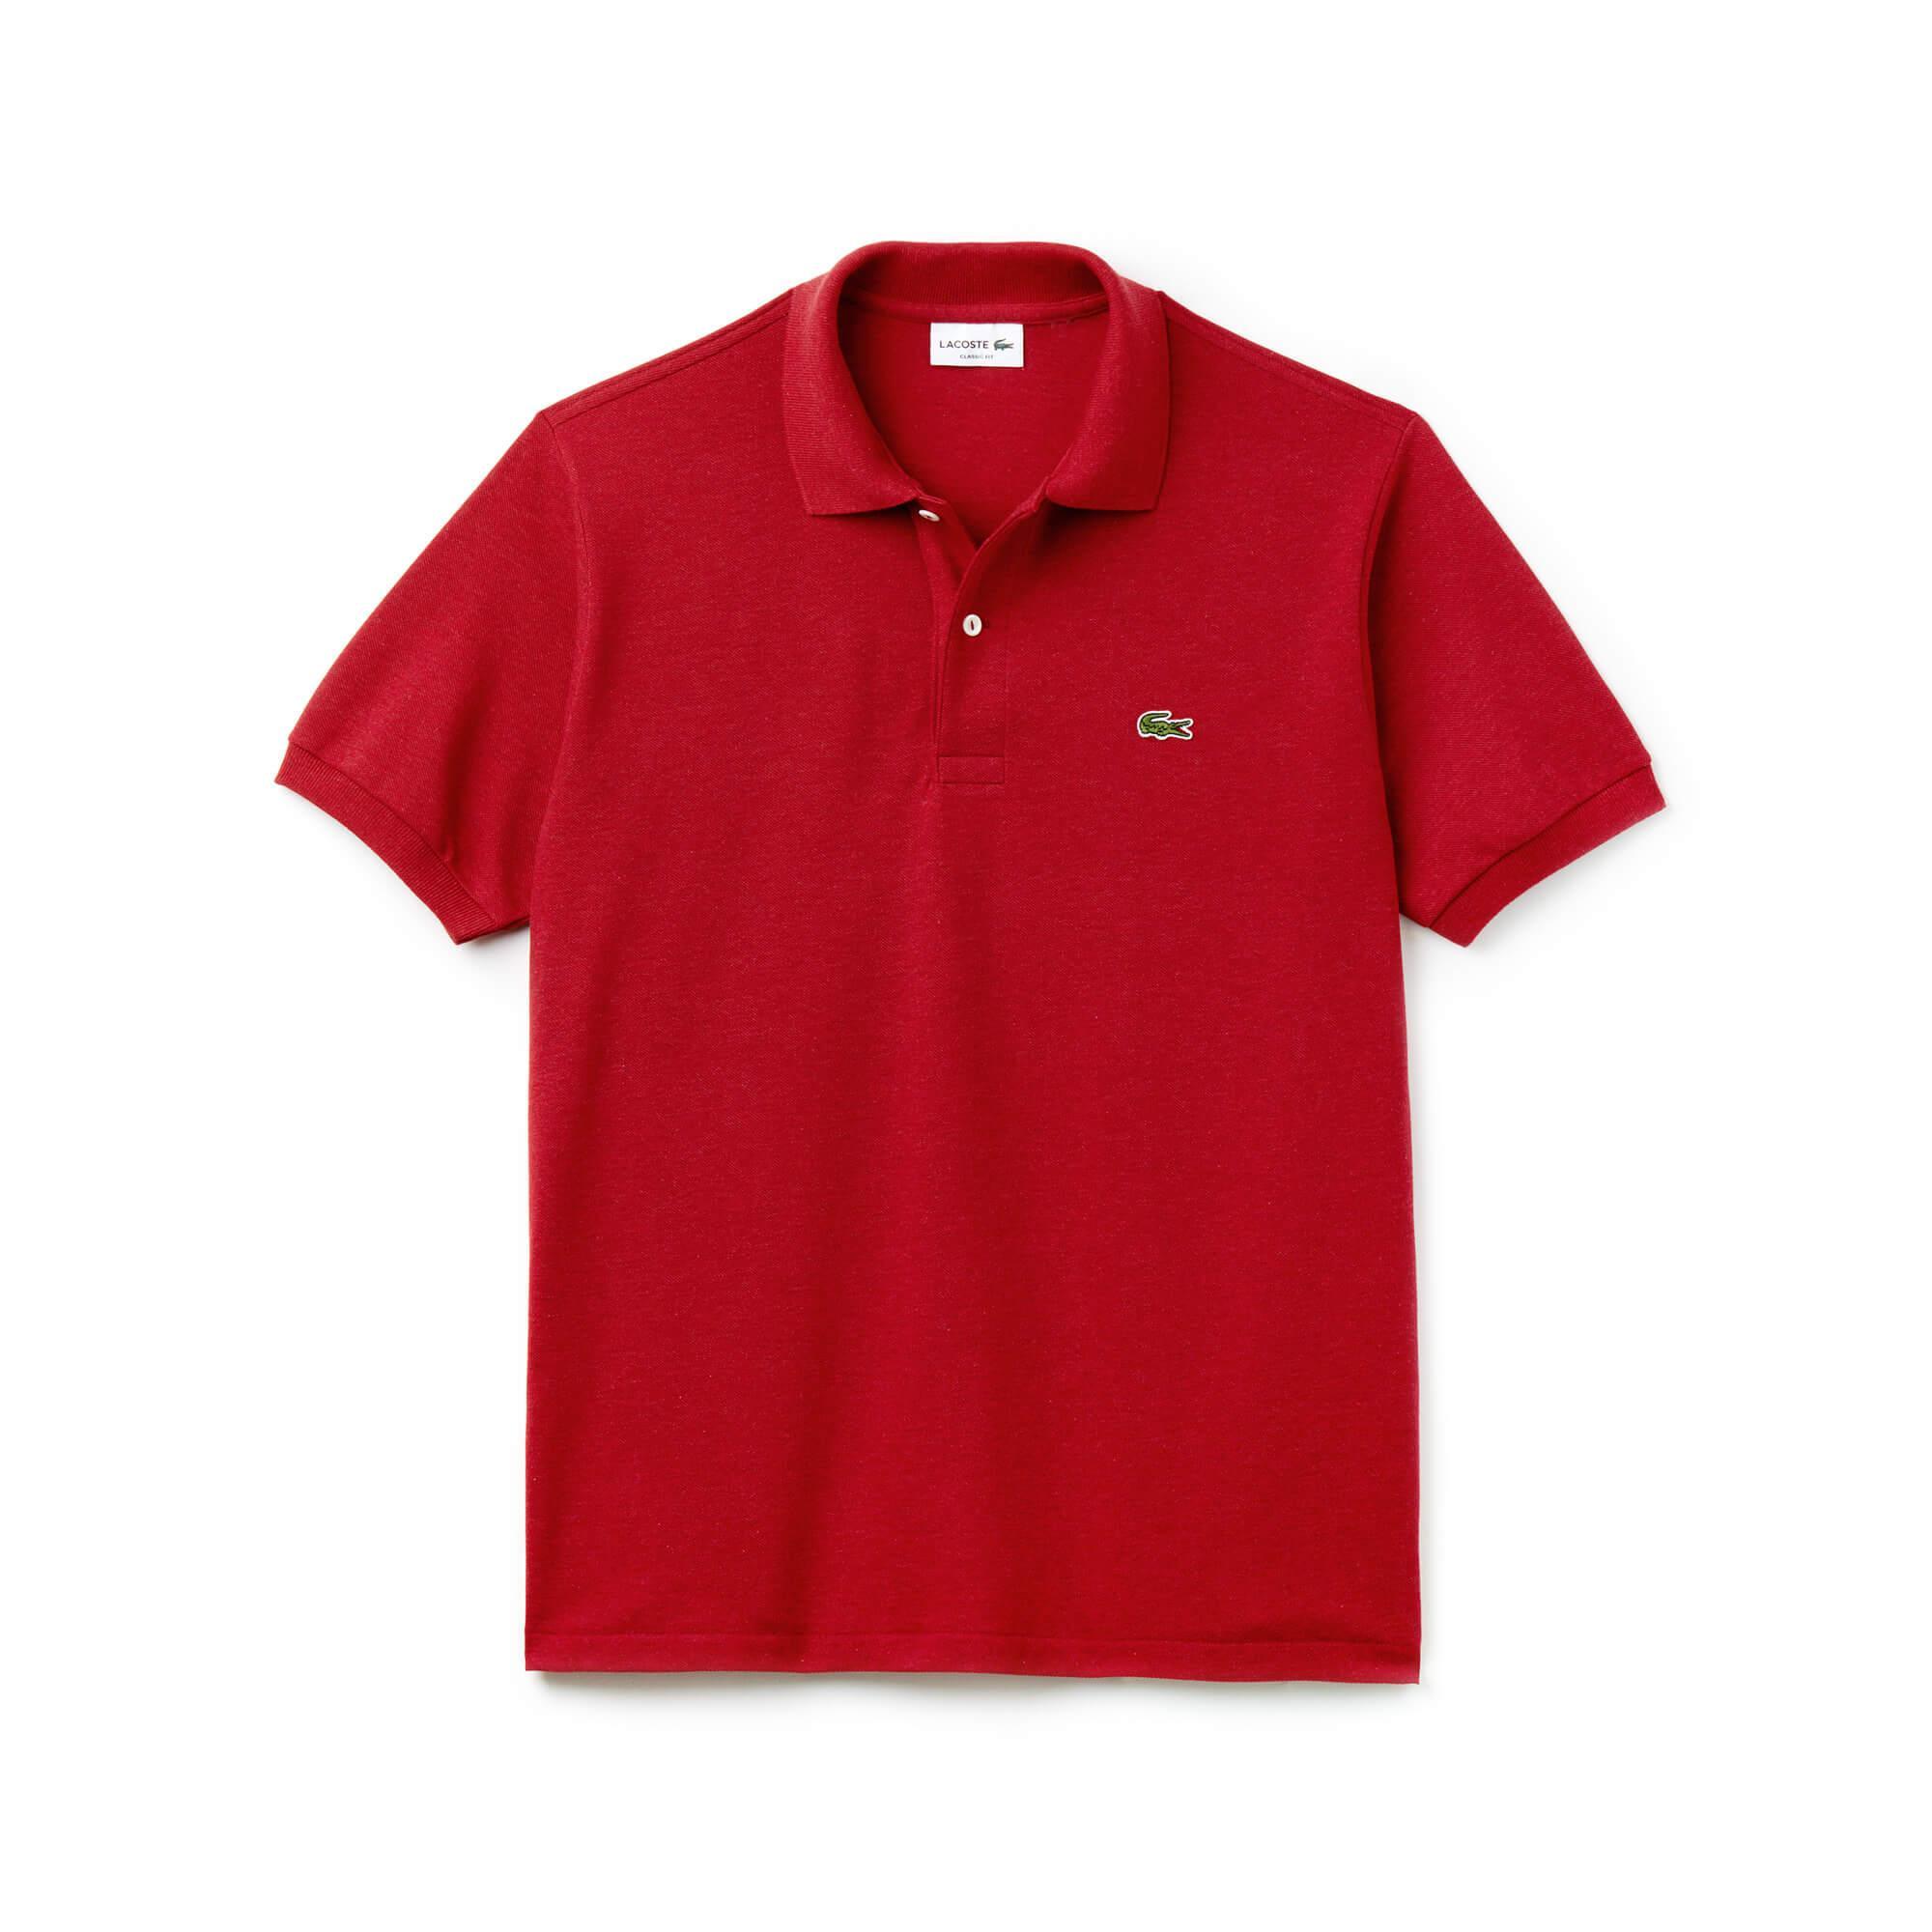 Lacoste Erkek Kırmızı Polo T-Shirt